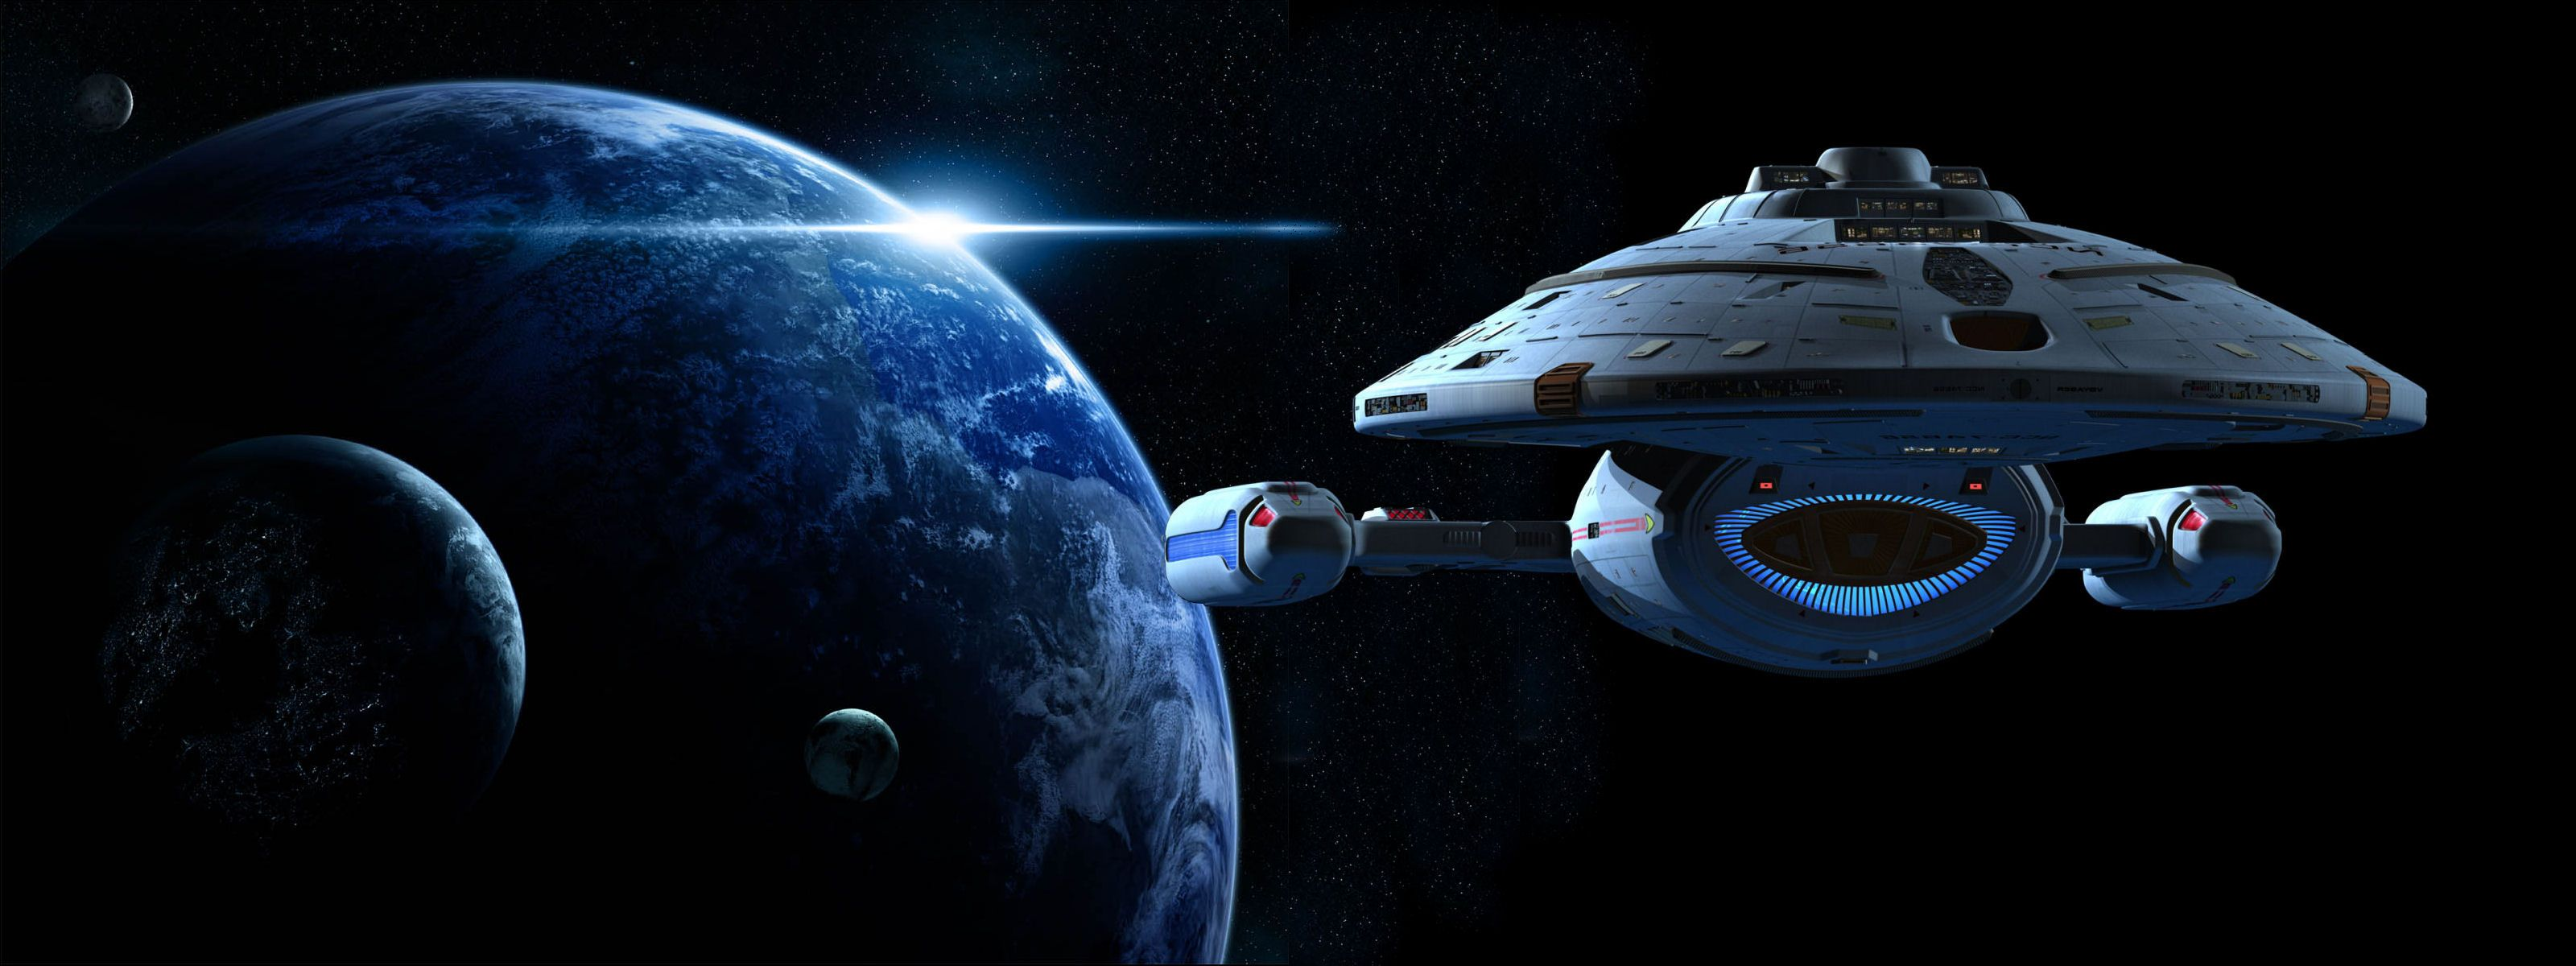 Star trek voyager spacecraft - Starship Voyager Star Trek Voyager Dual Screen Wallpaper Voyager Leaving For Home